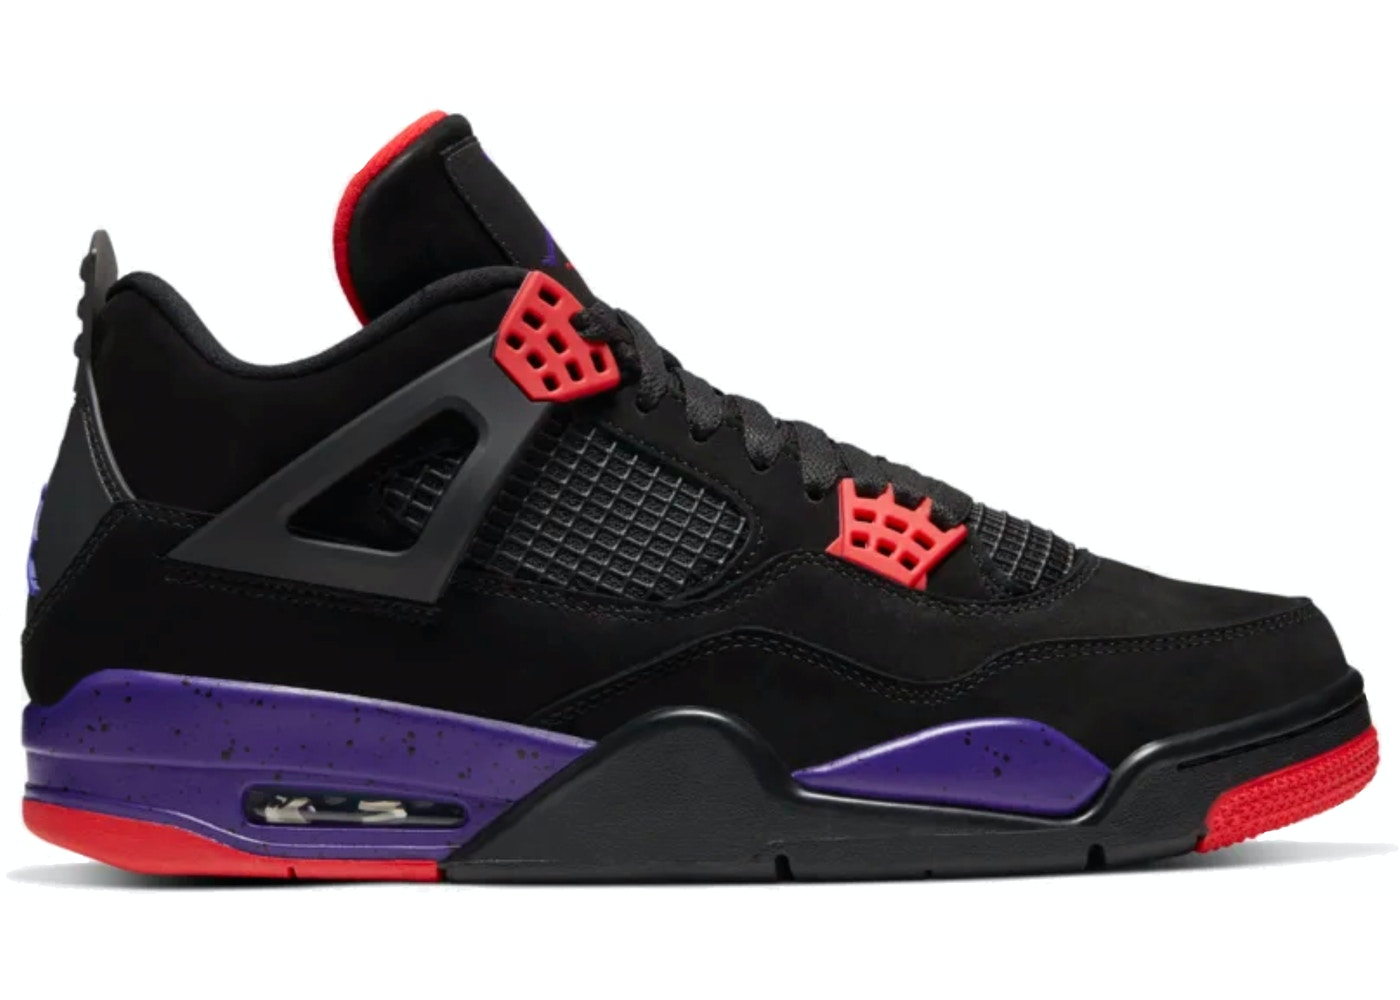 Jordan 4 Retro Raptors Drake OVO (2019)